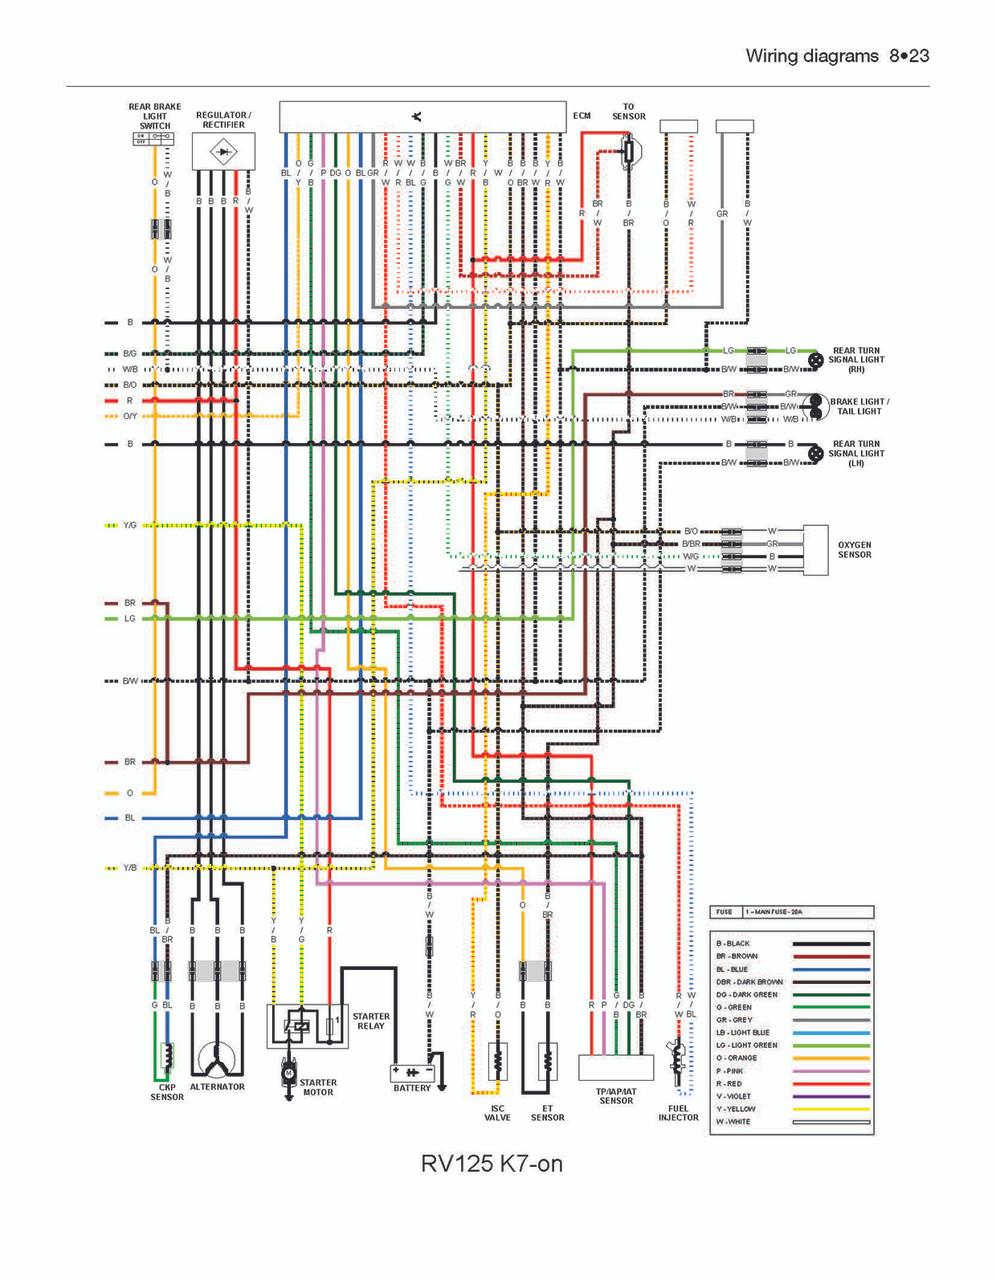 suzuki rv125 electrical diagram product wiring diagrams u2022 1973 suzuki rover suzuki rv90 wiring diagram [ 996 x 1280 Pixel ]